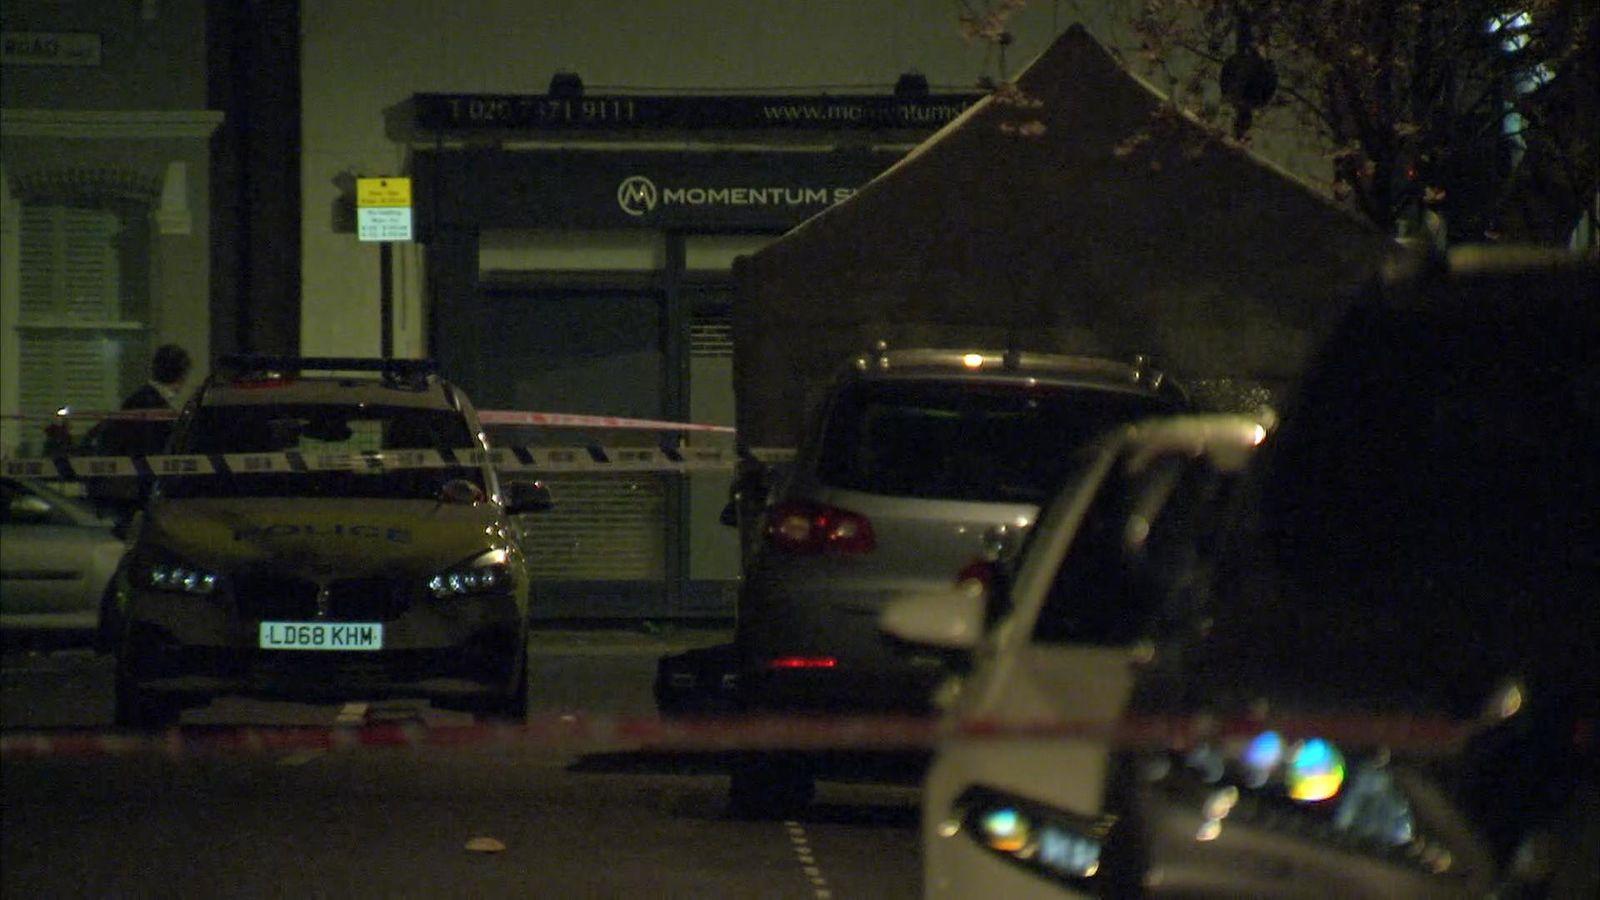 Man dies after stabbing in southwest London